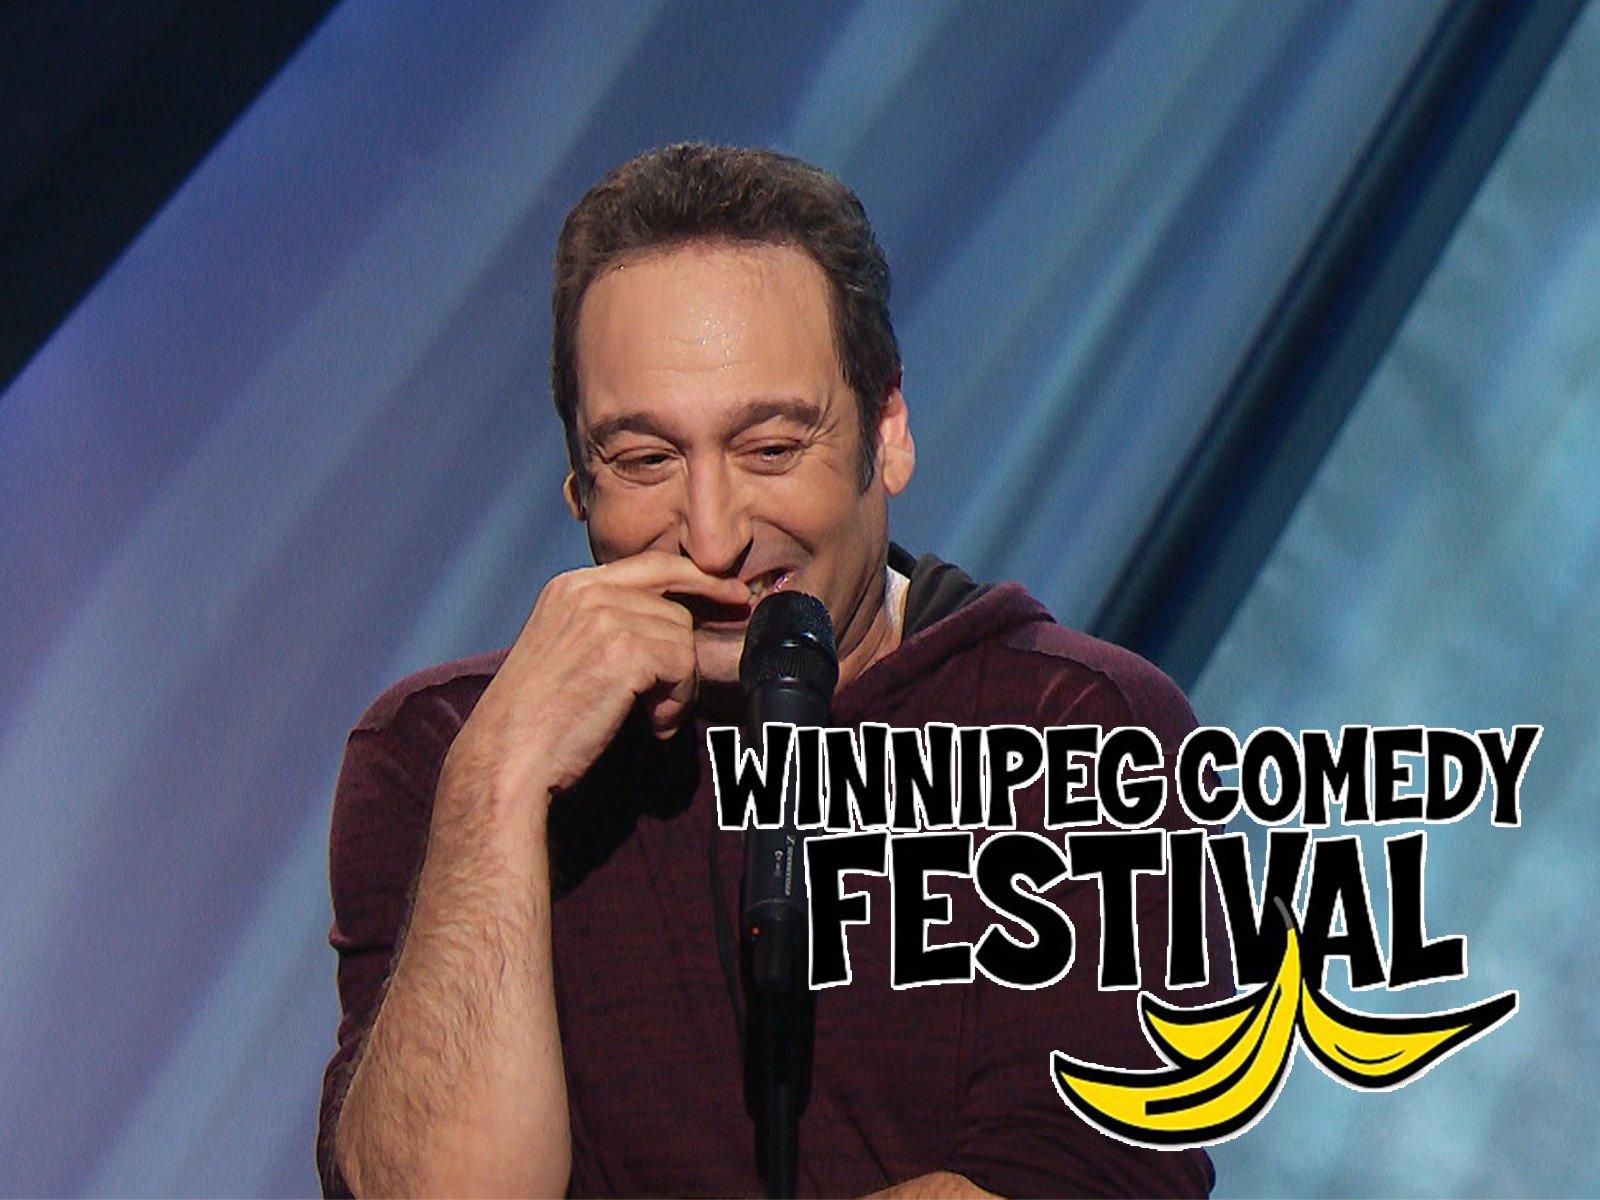 The Winnipeg Comedy Festival